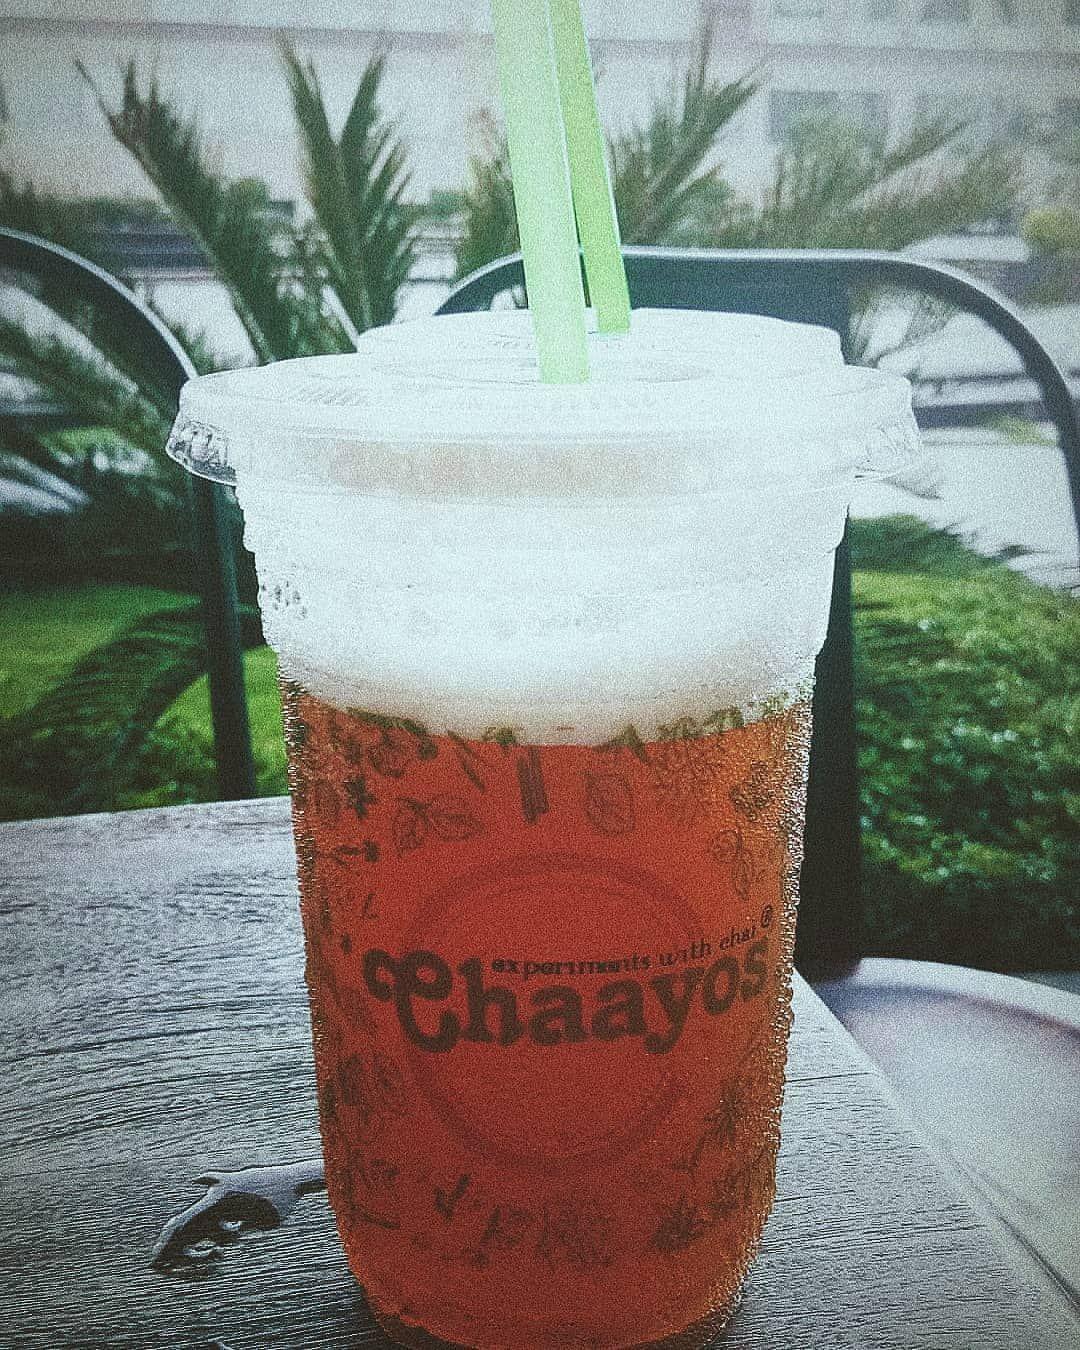 Cooldrinks Fun Drinks Iced Tea Chillax